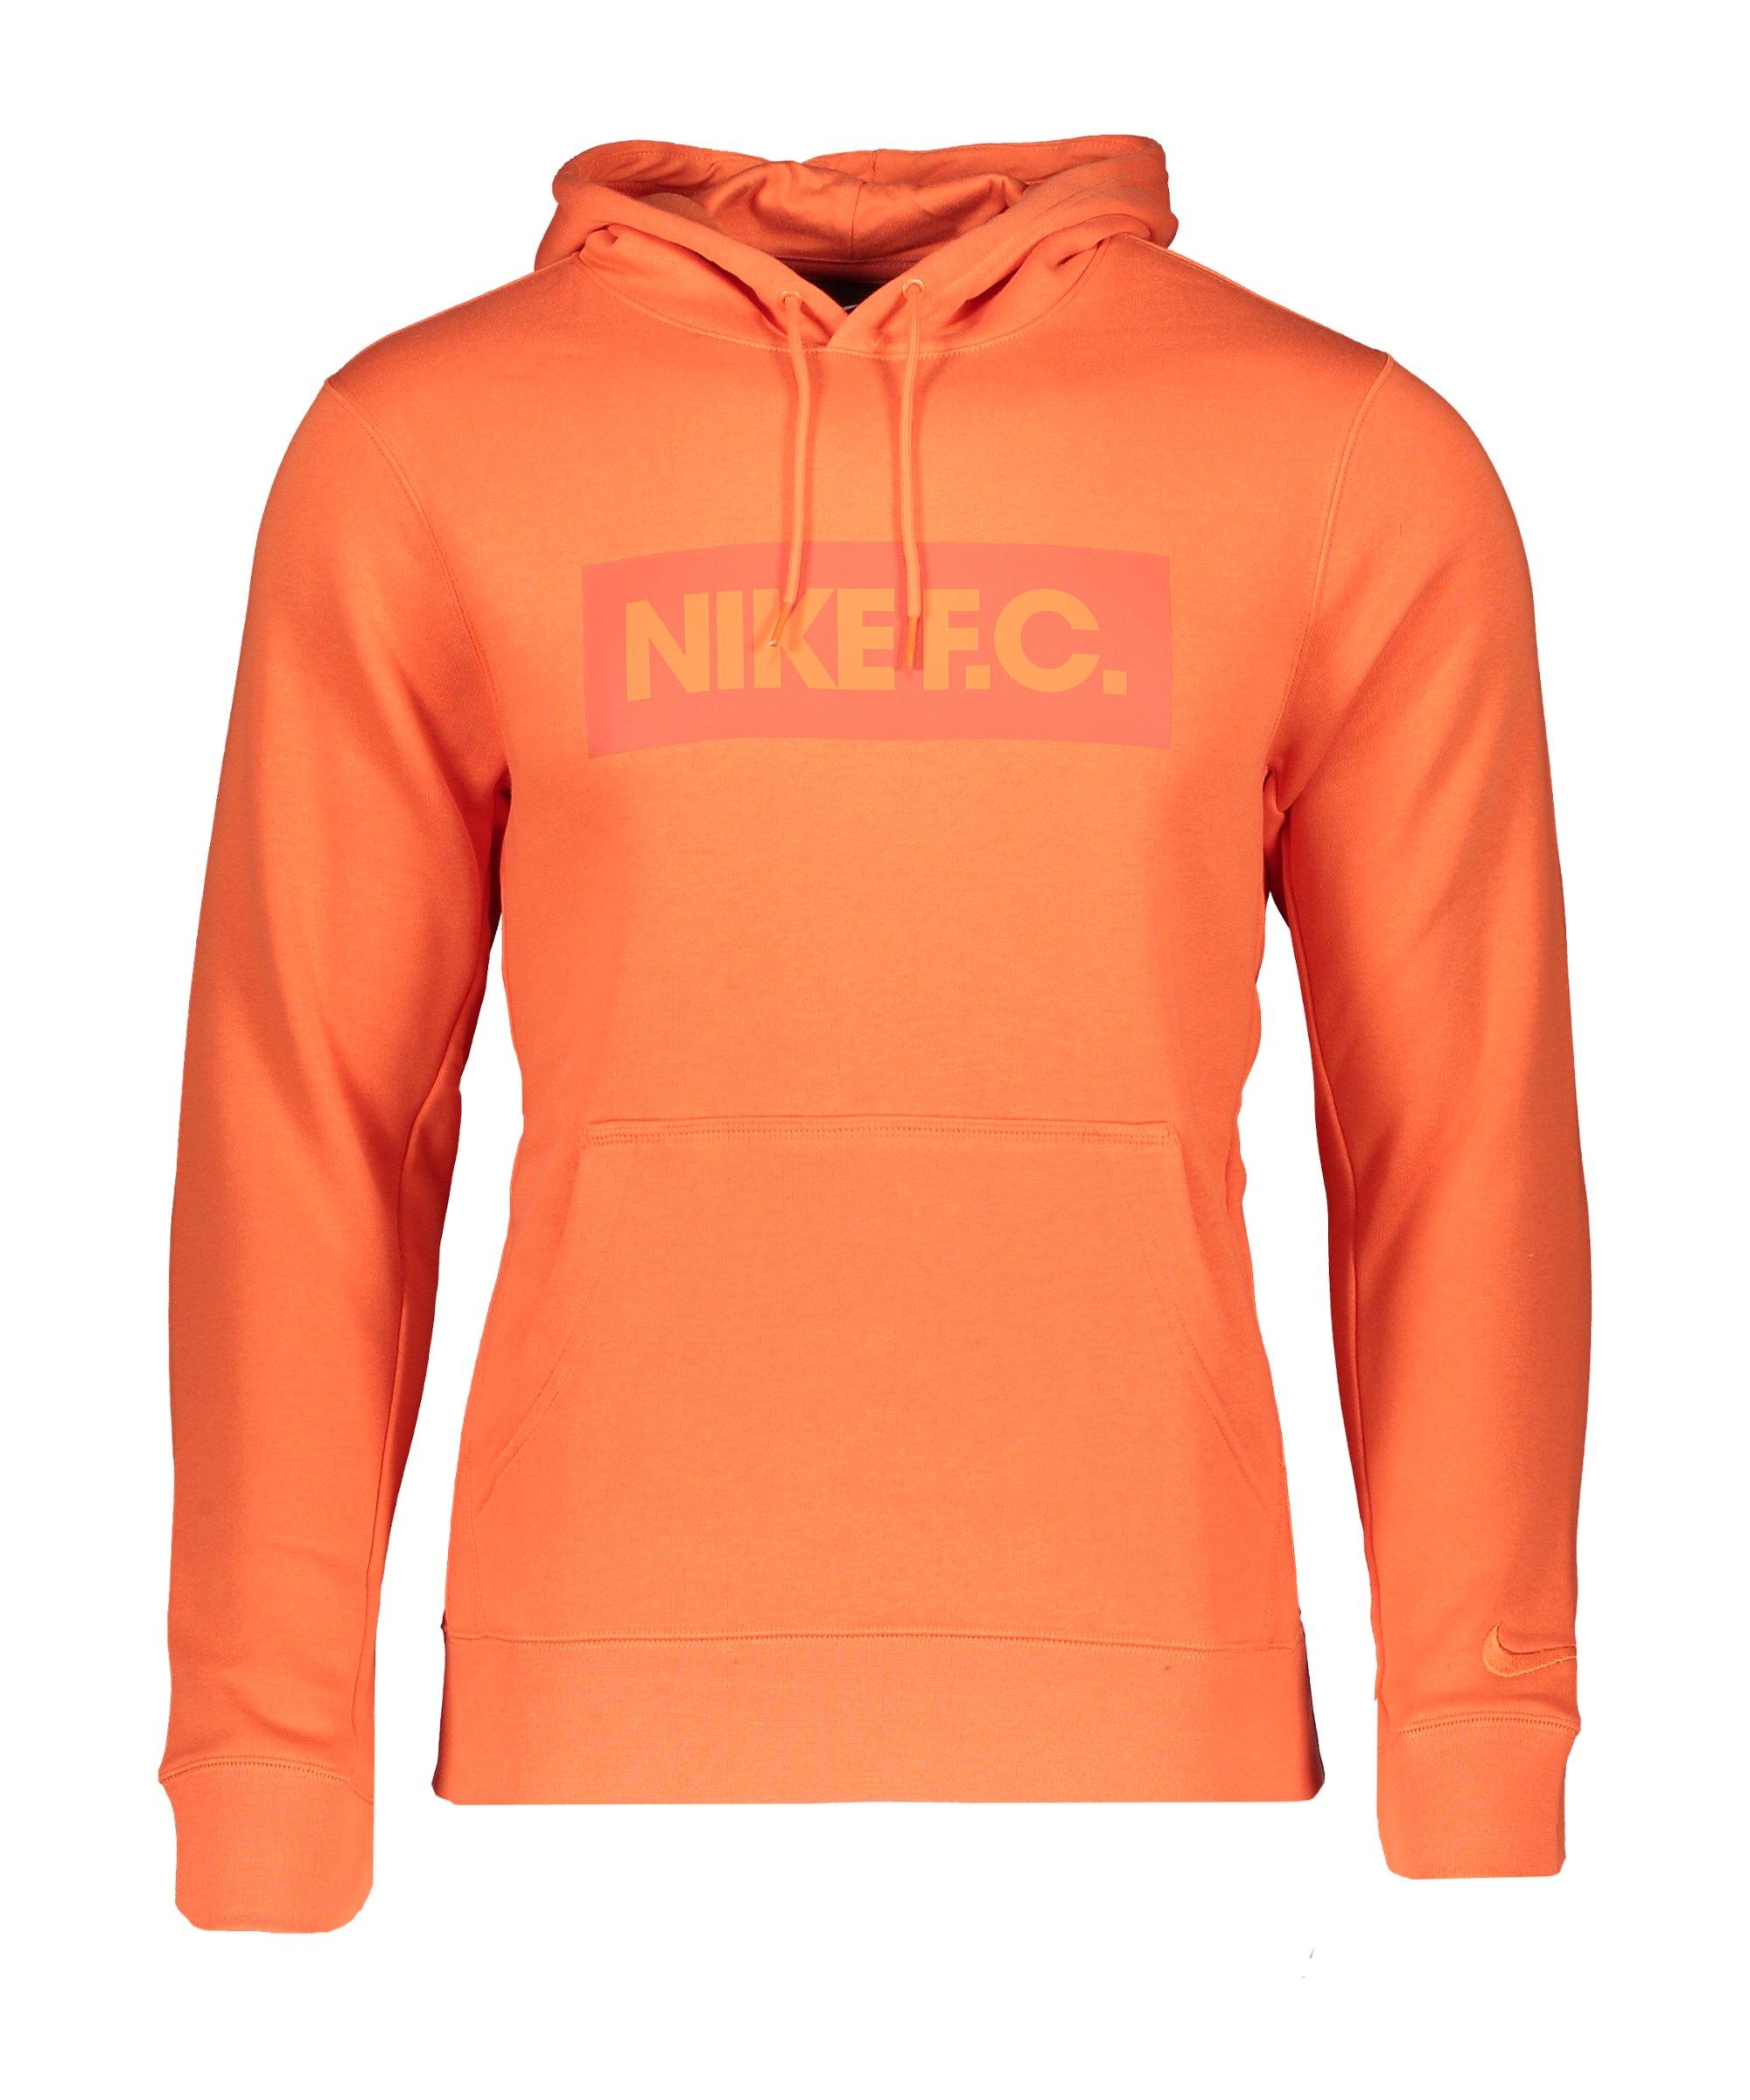 Nike F.C. Fleece Hoody Orange F837 - orange